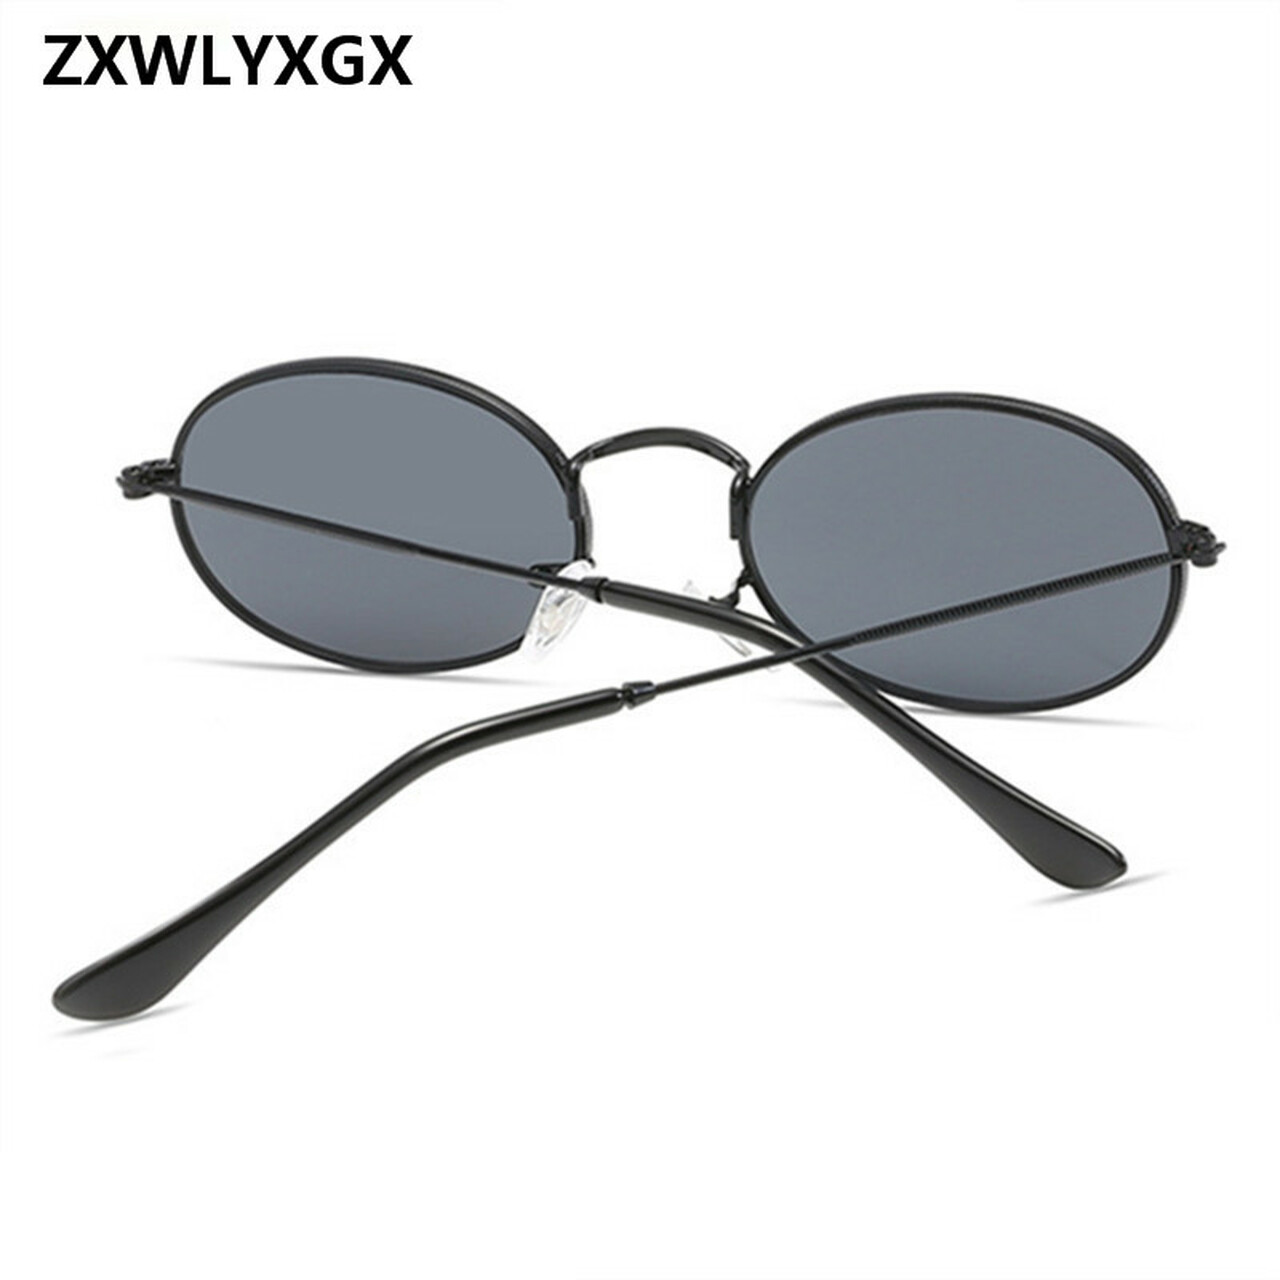 413d5adc73 ... ZXWLYXGX 2018 Vintage Oval Small Metal Frame Steampunk Sunglasses Men  Women New Fashion Sun Glasses Female ...